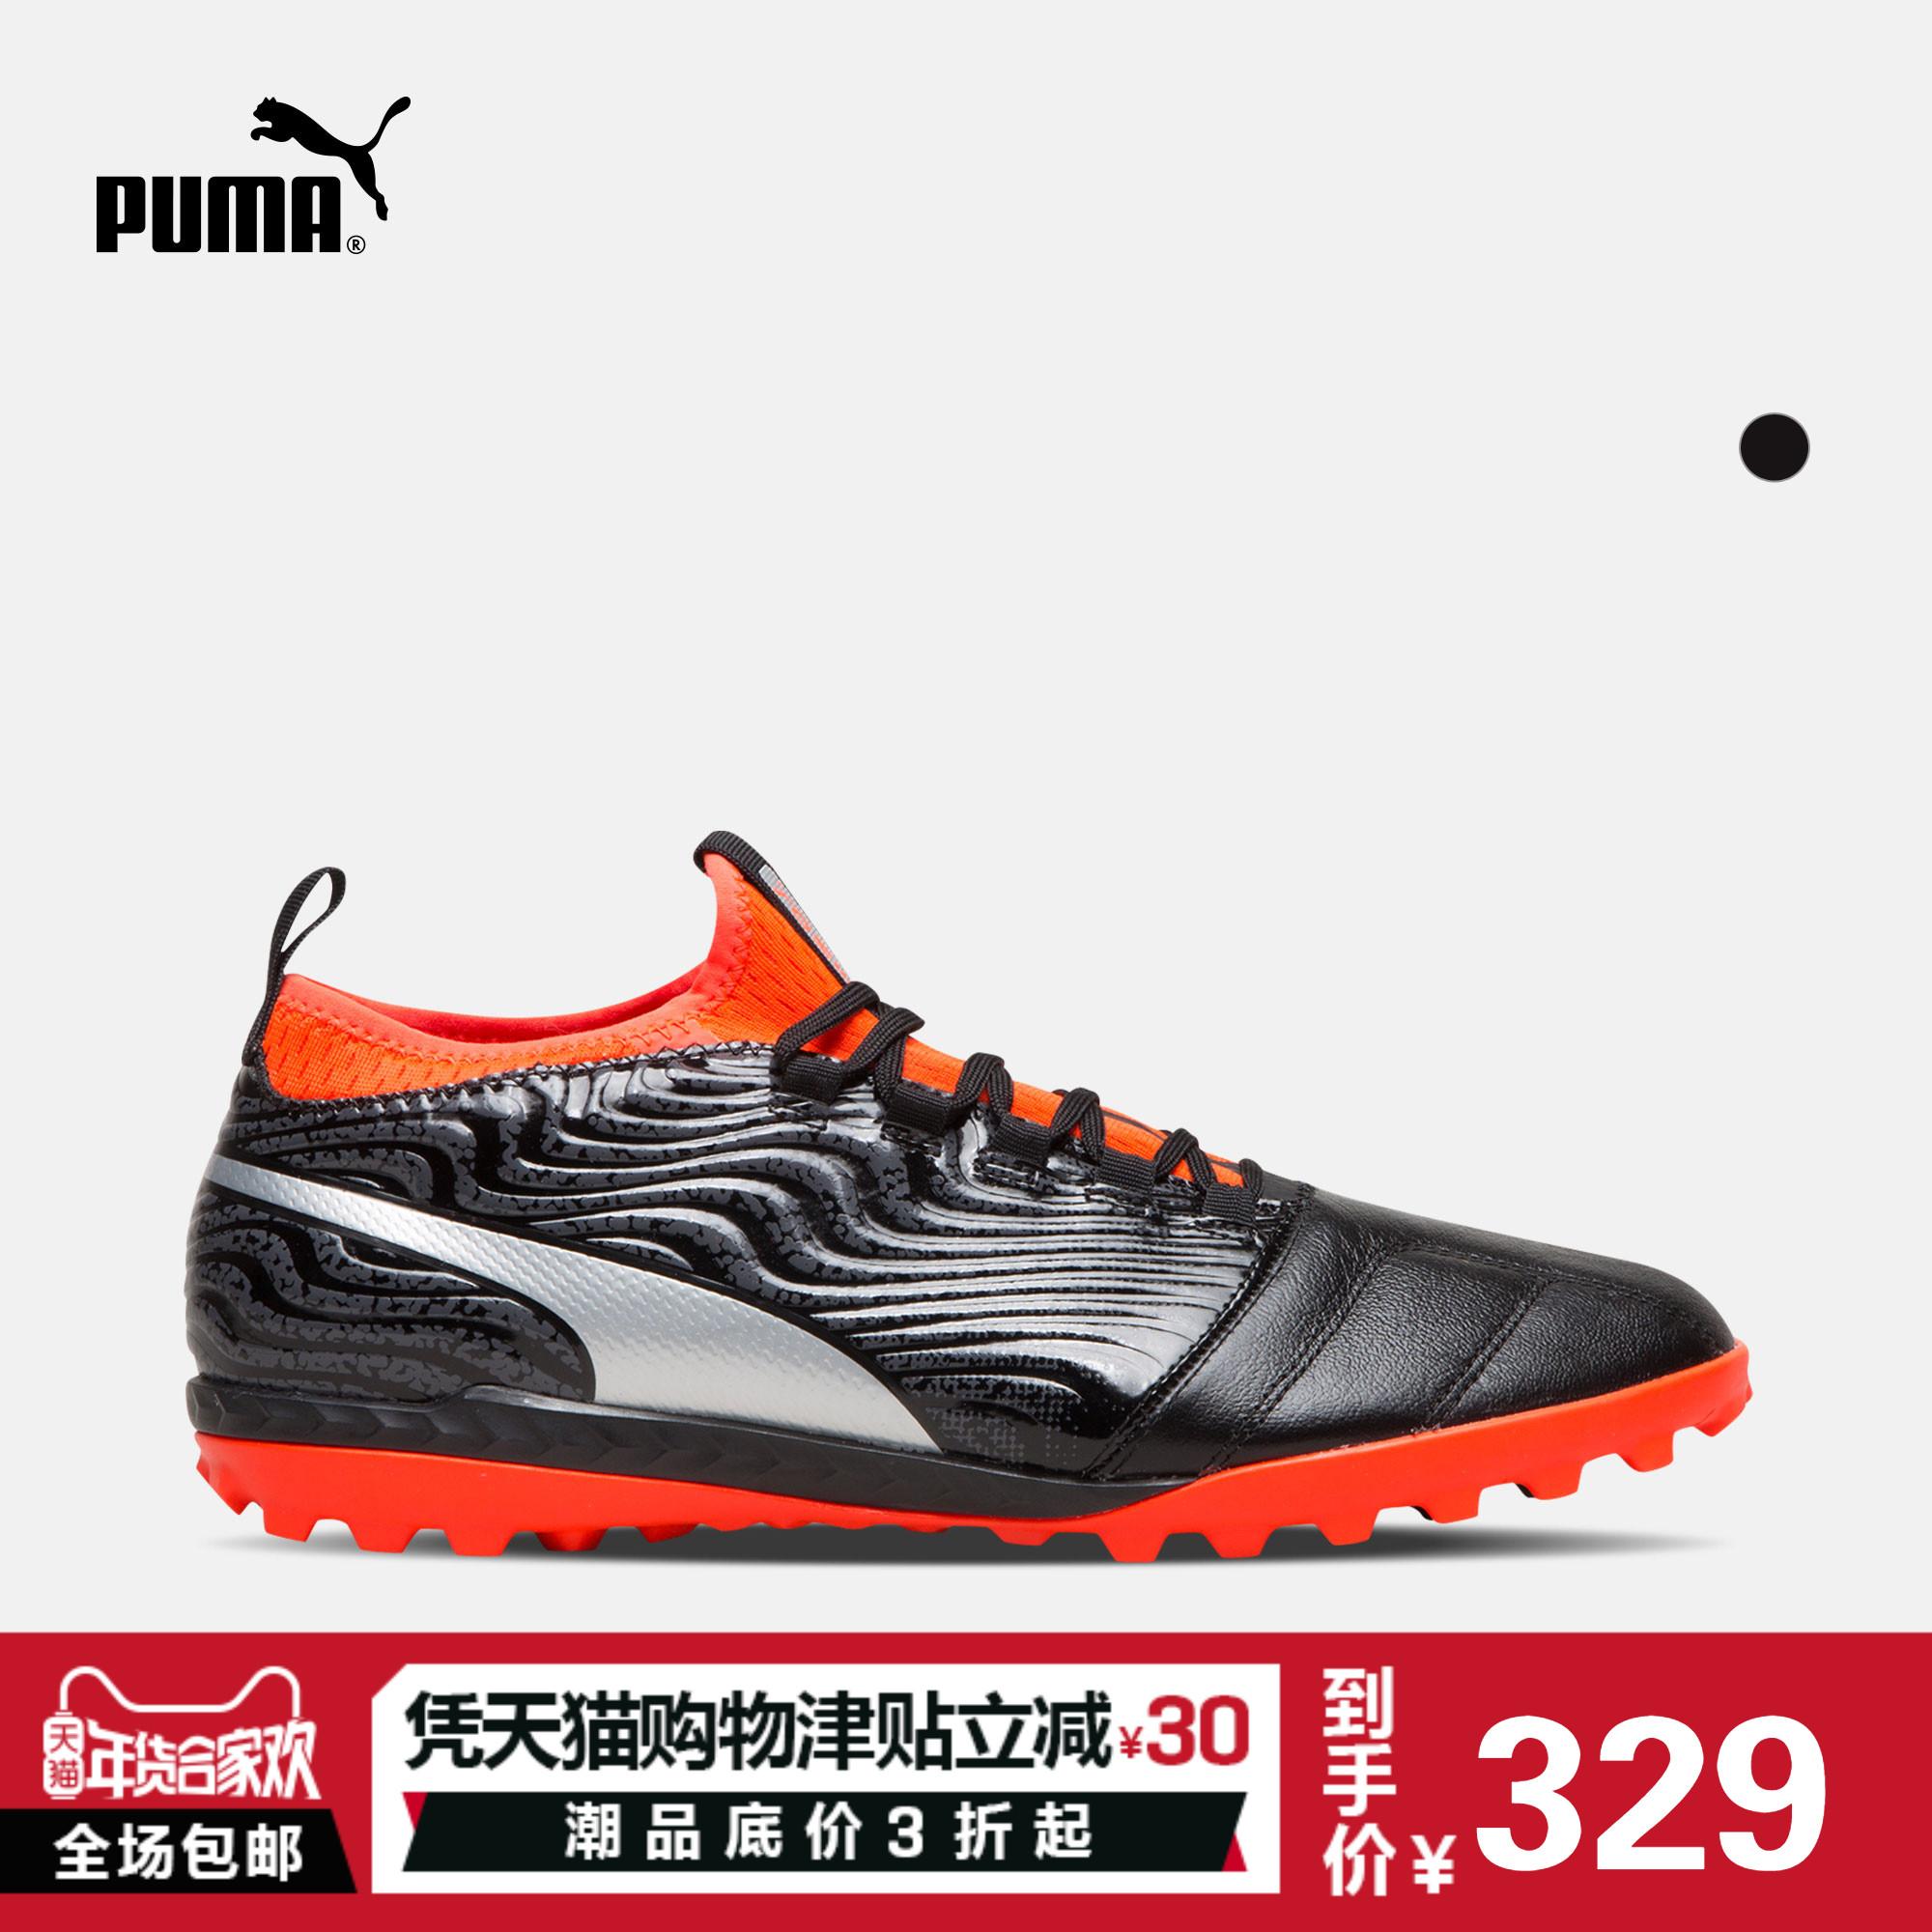 PUMA彪马官方 男子足球鞋 PUMA ONE 18.3 TT 104542